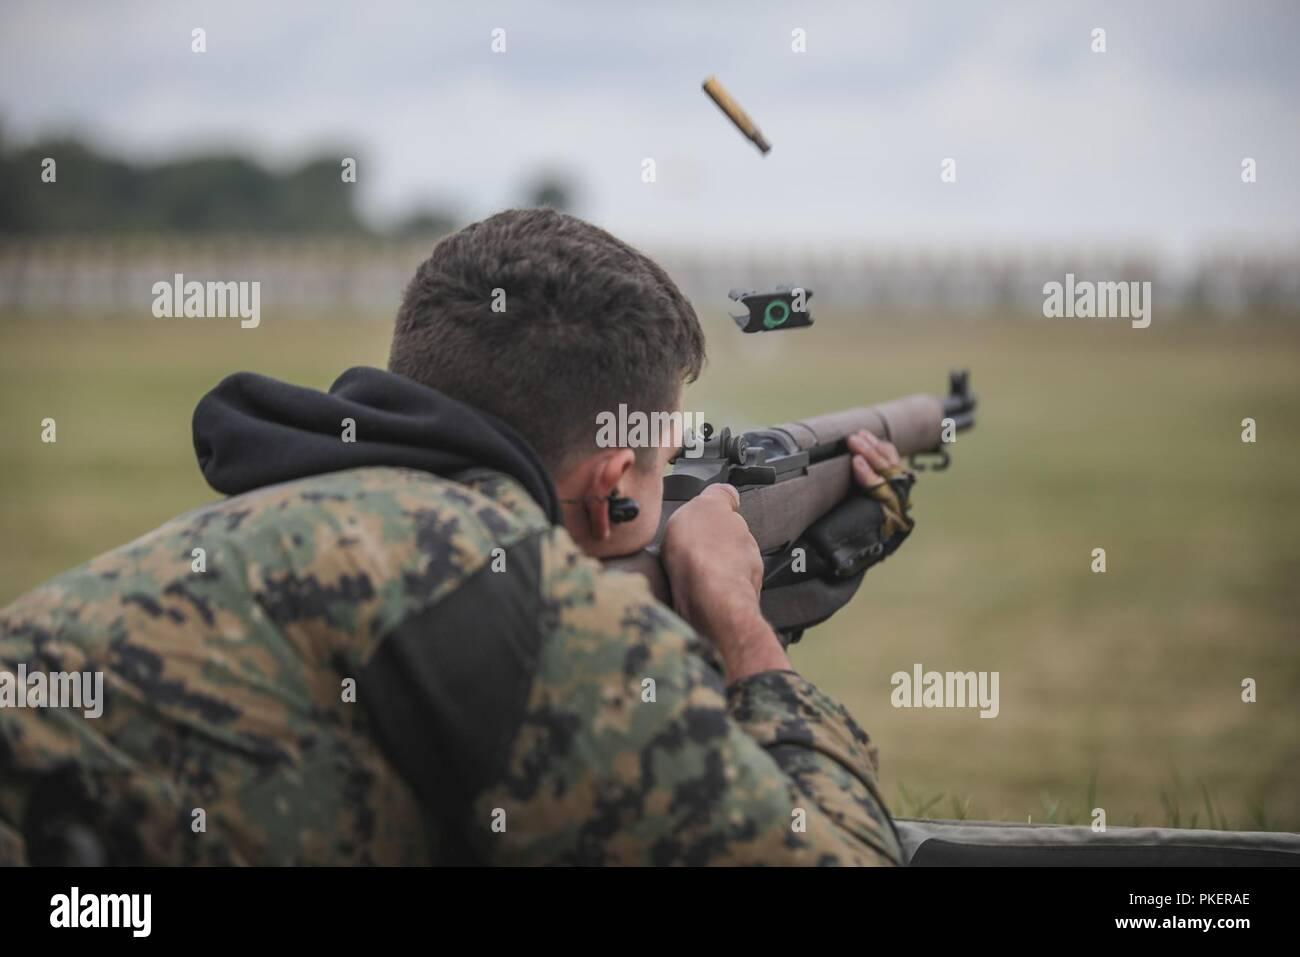 fe095edc0ba U.S. Marine Corps Sgt. Cody Cheney shoots the M1 Garand rifle during the  Hearst Doubles